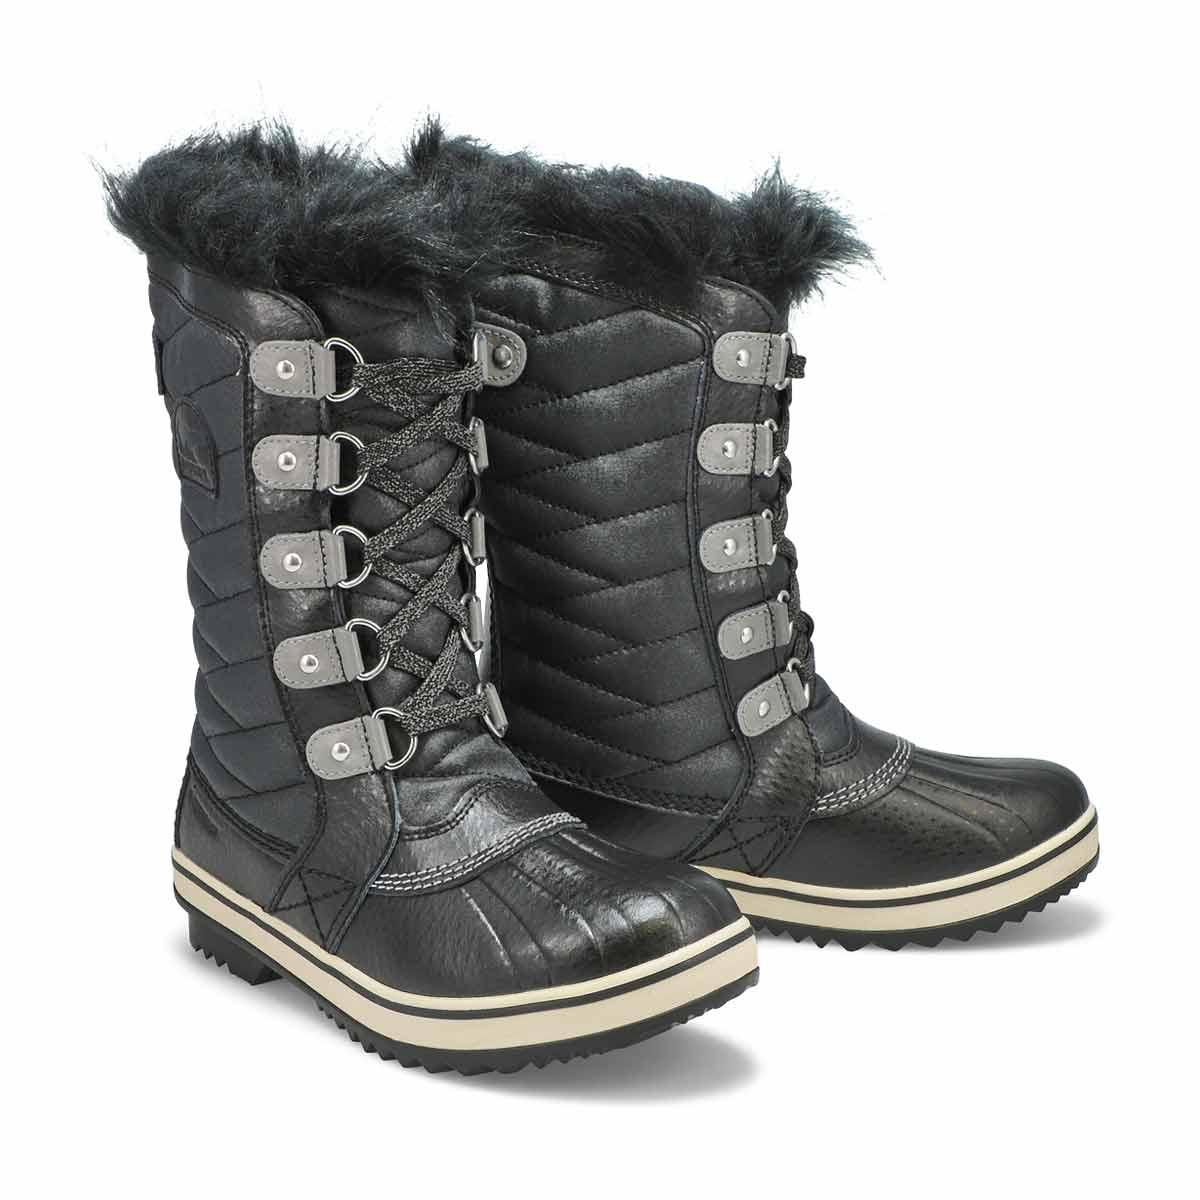 Botte hiver imp. TOFINO II, noir, filles